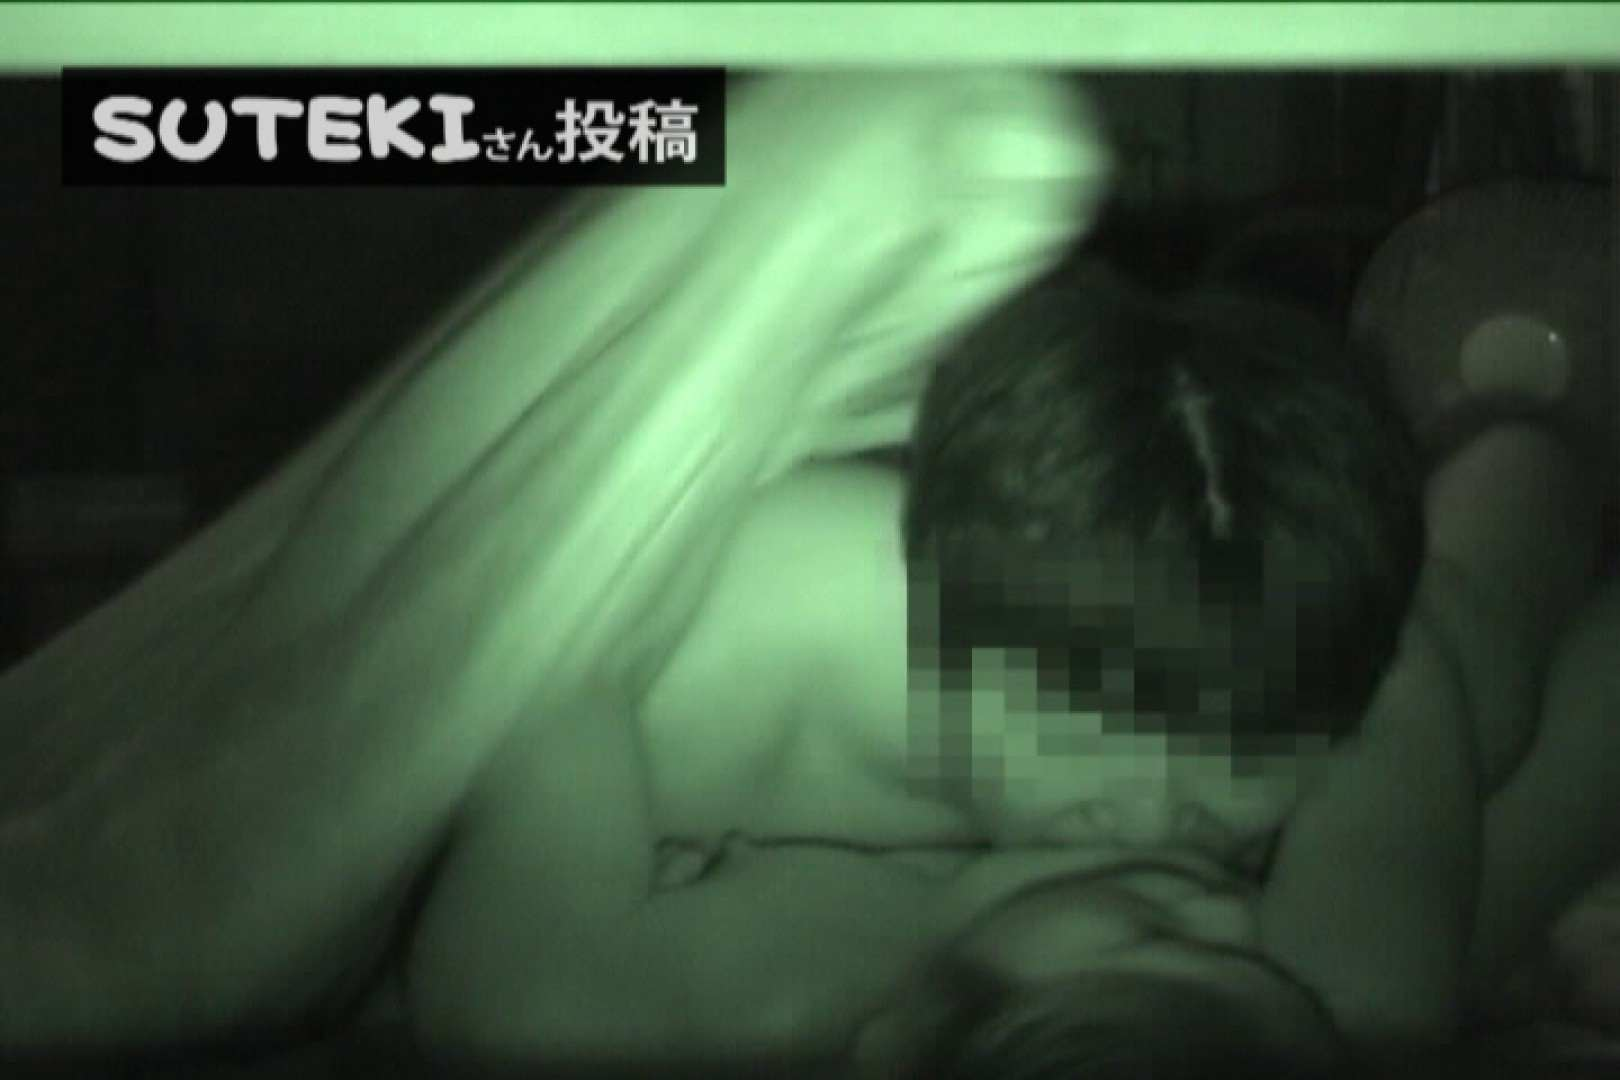 SUTEKIさん投稿 スーパーナイトショット SEX映像 隠し撮りオマンコ動画紹介 97pic 43